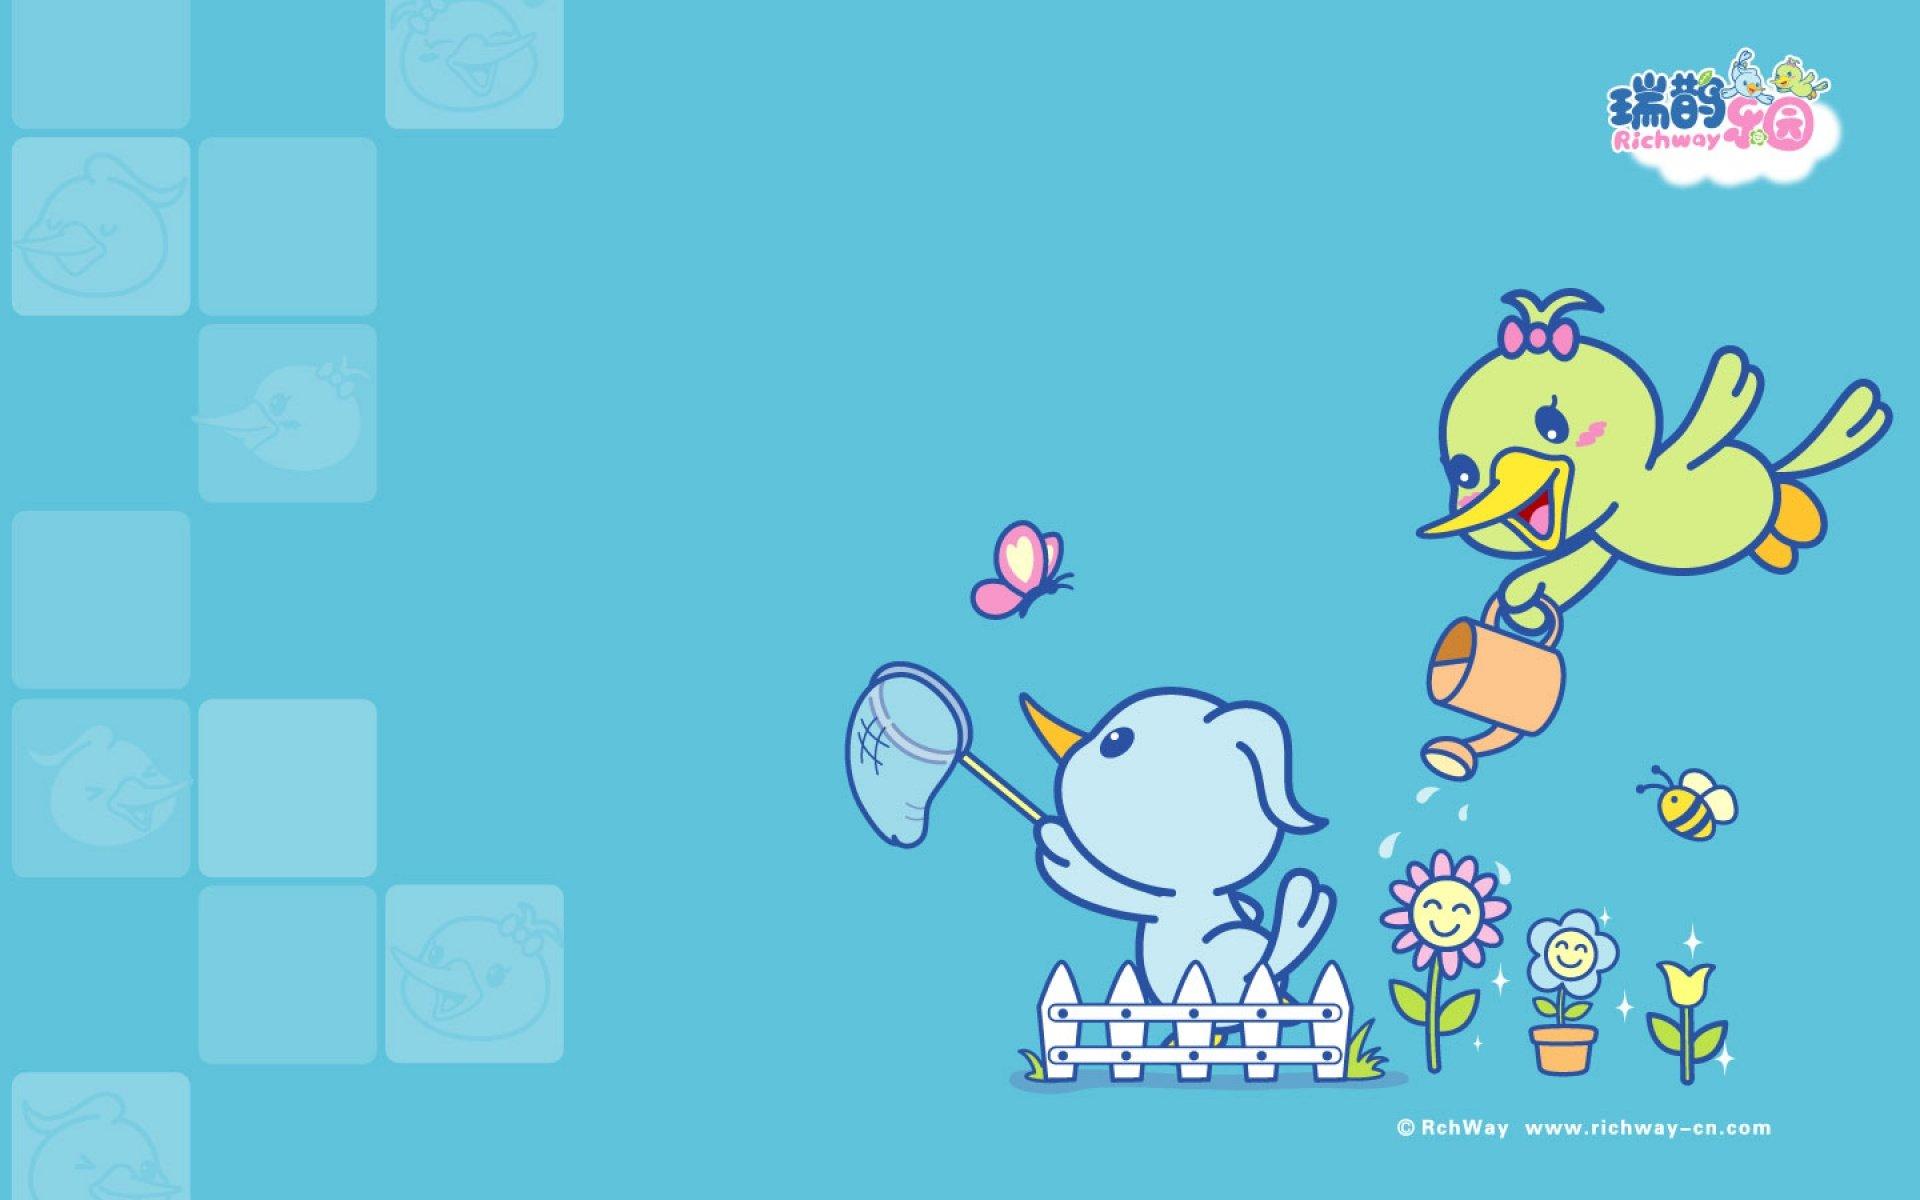 android安卓瑞鹊乐园 卡通 可爱高清手机壁纸免费下载